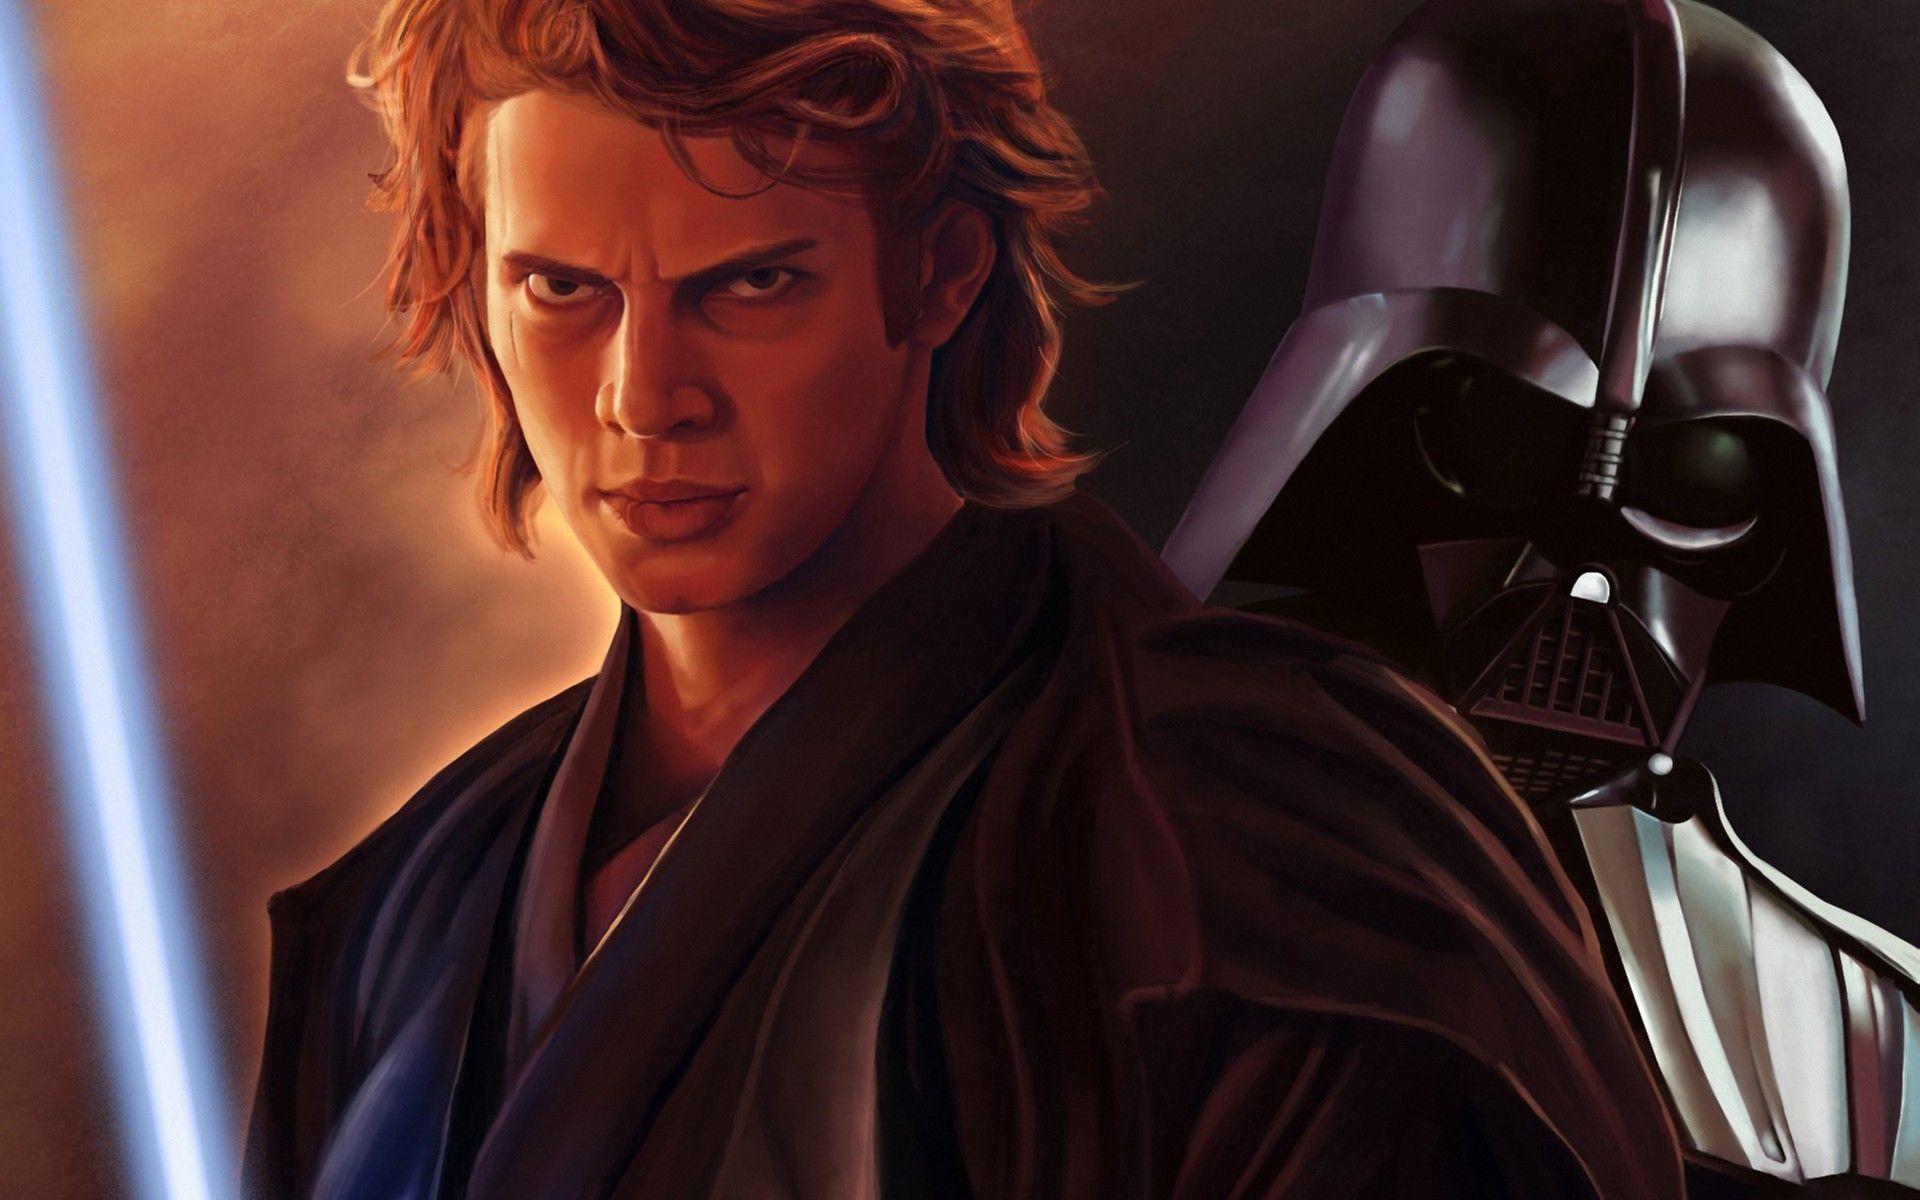 Anakin Skywalker Wallpapers 1920x1200